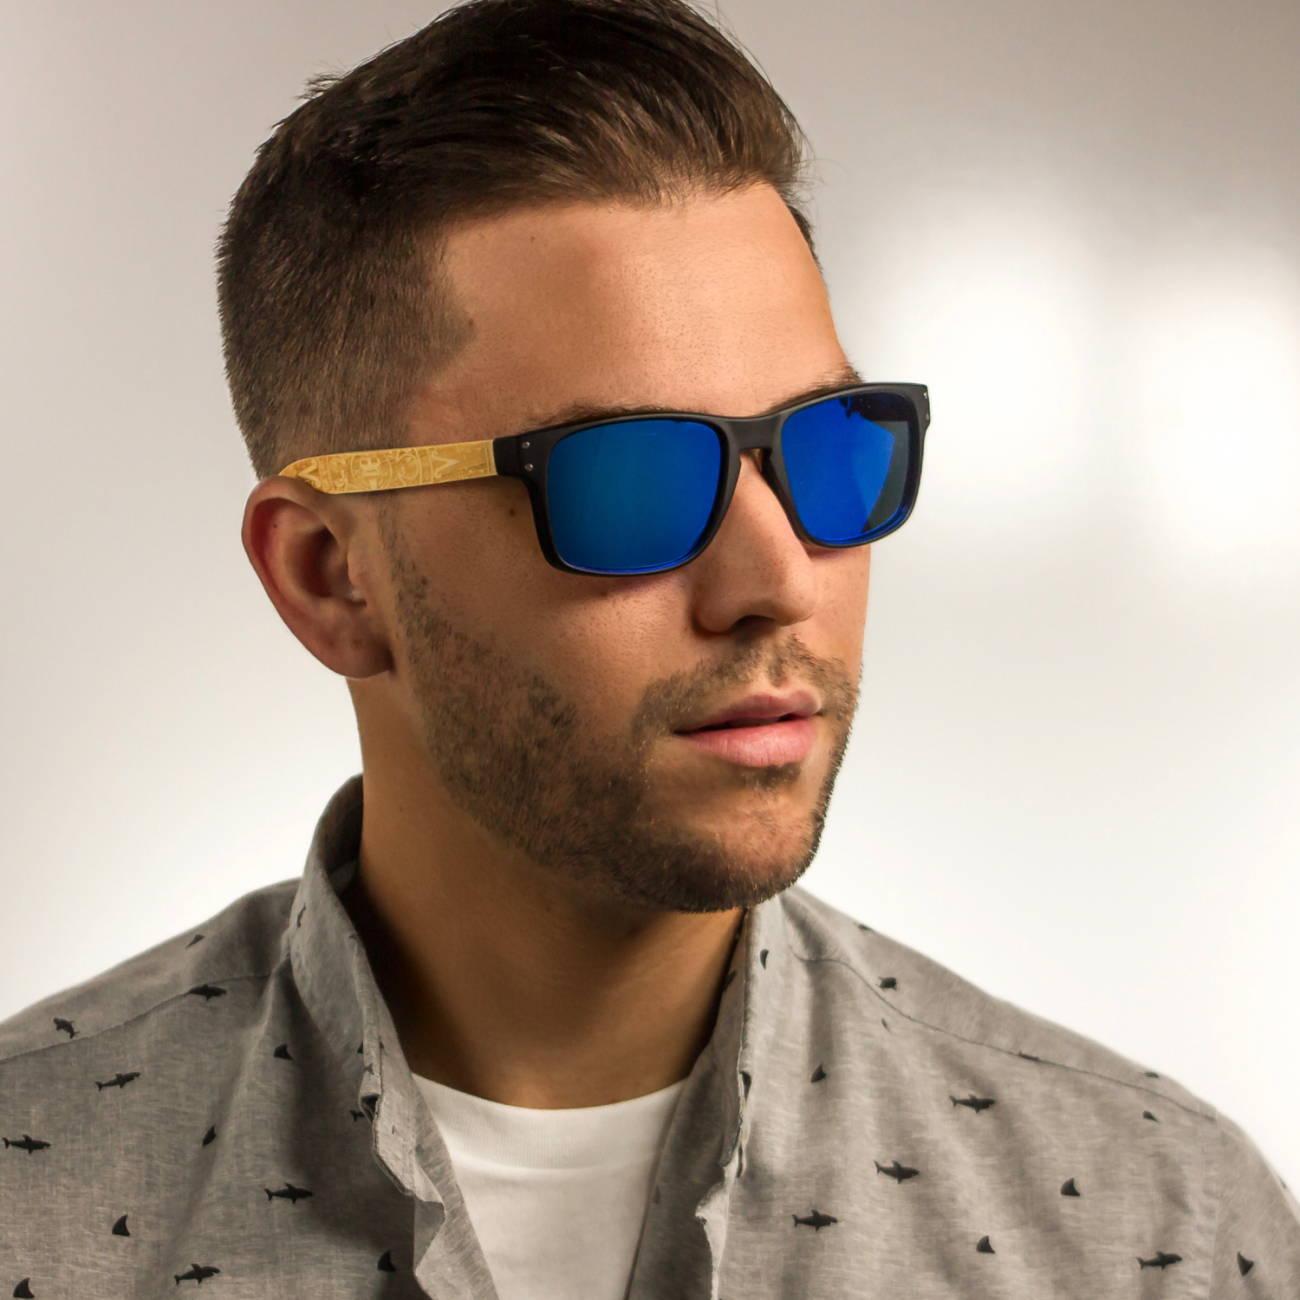 Volcanic Blue Polarized Sunglasses